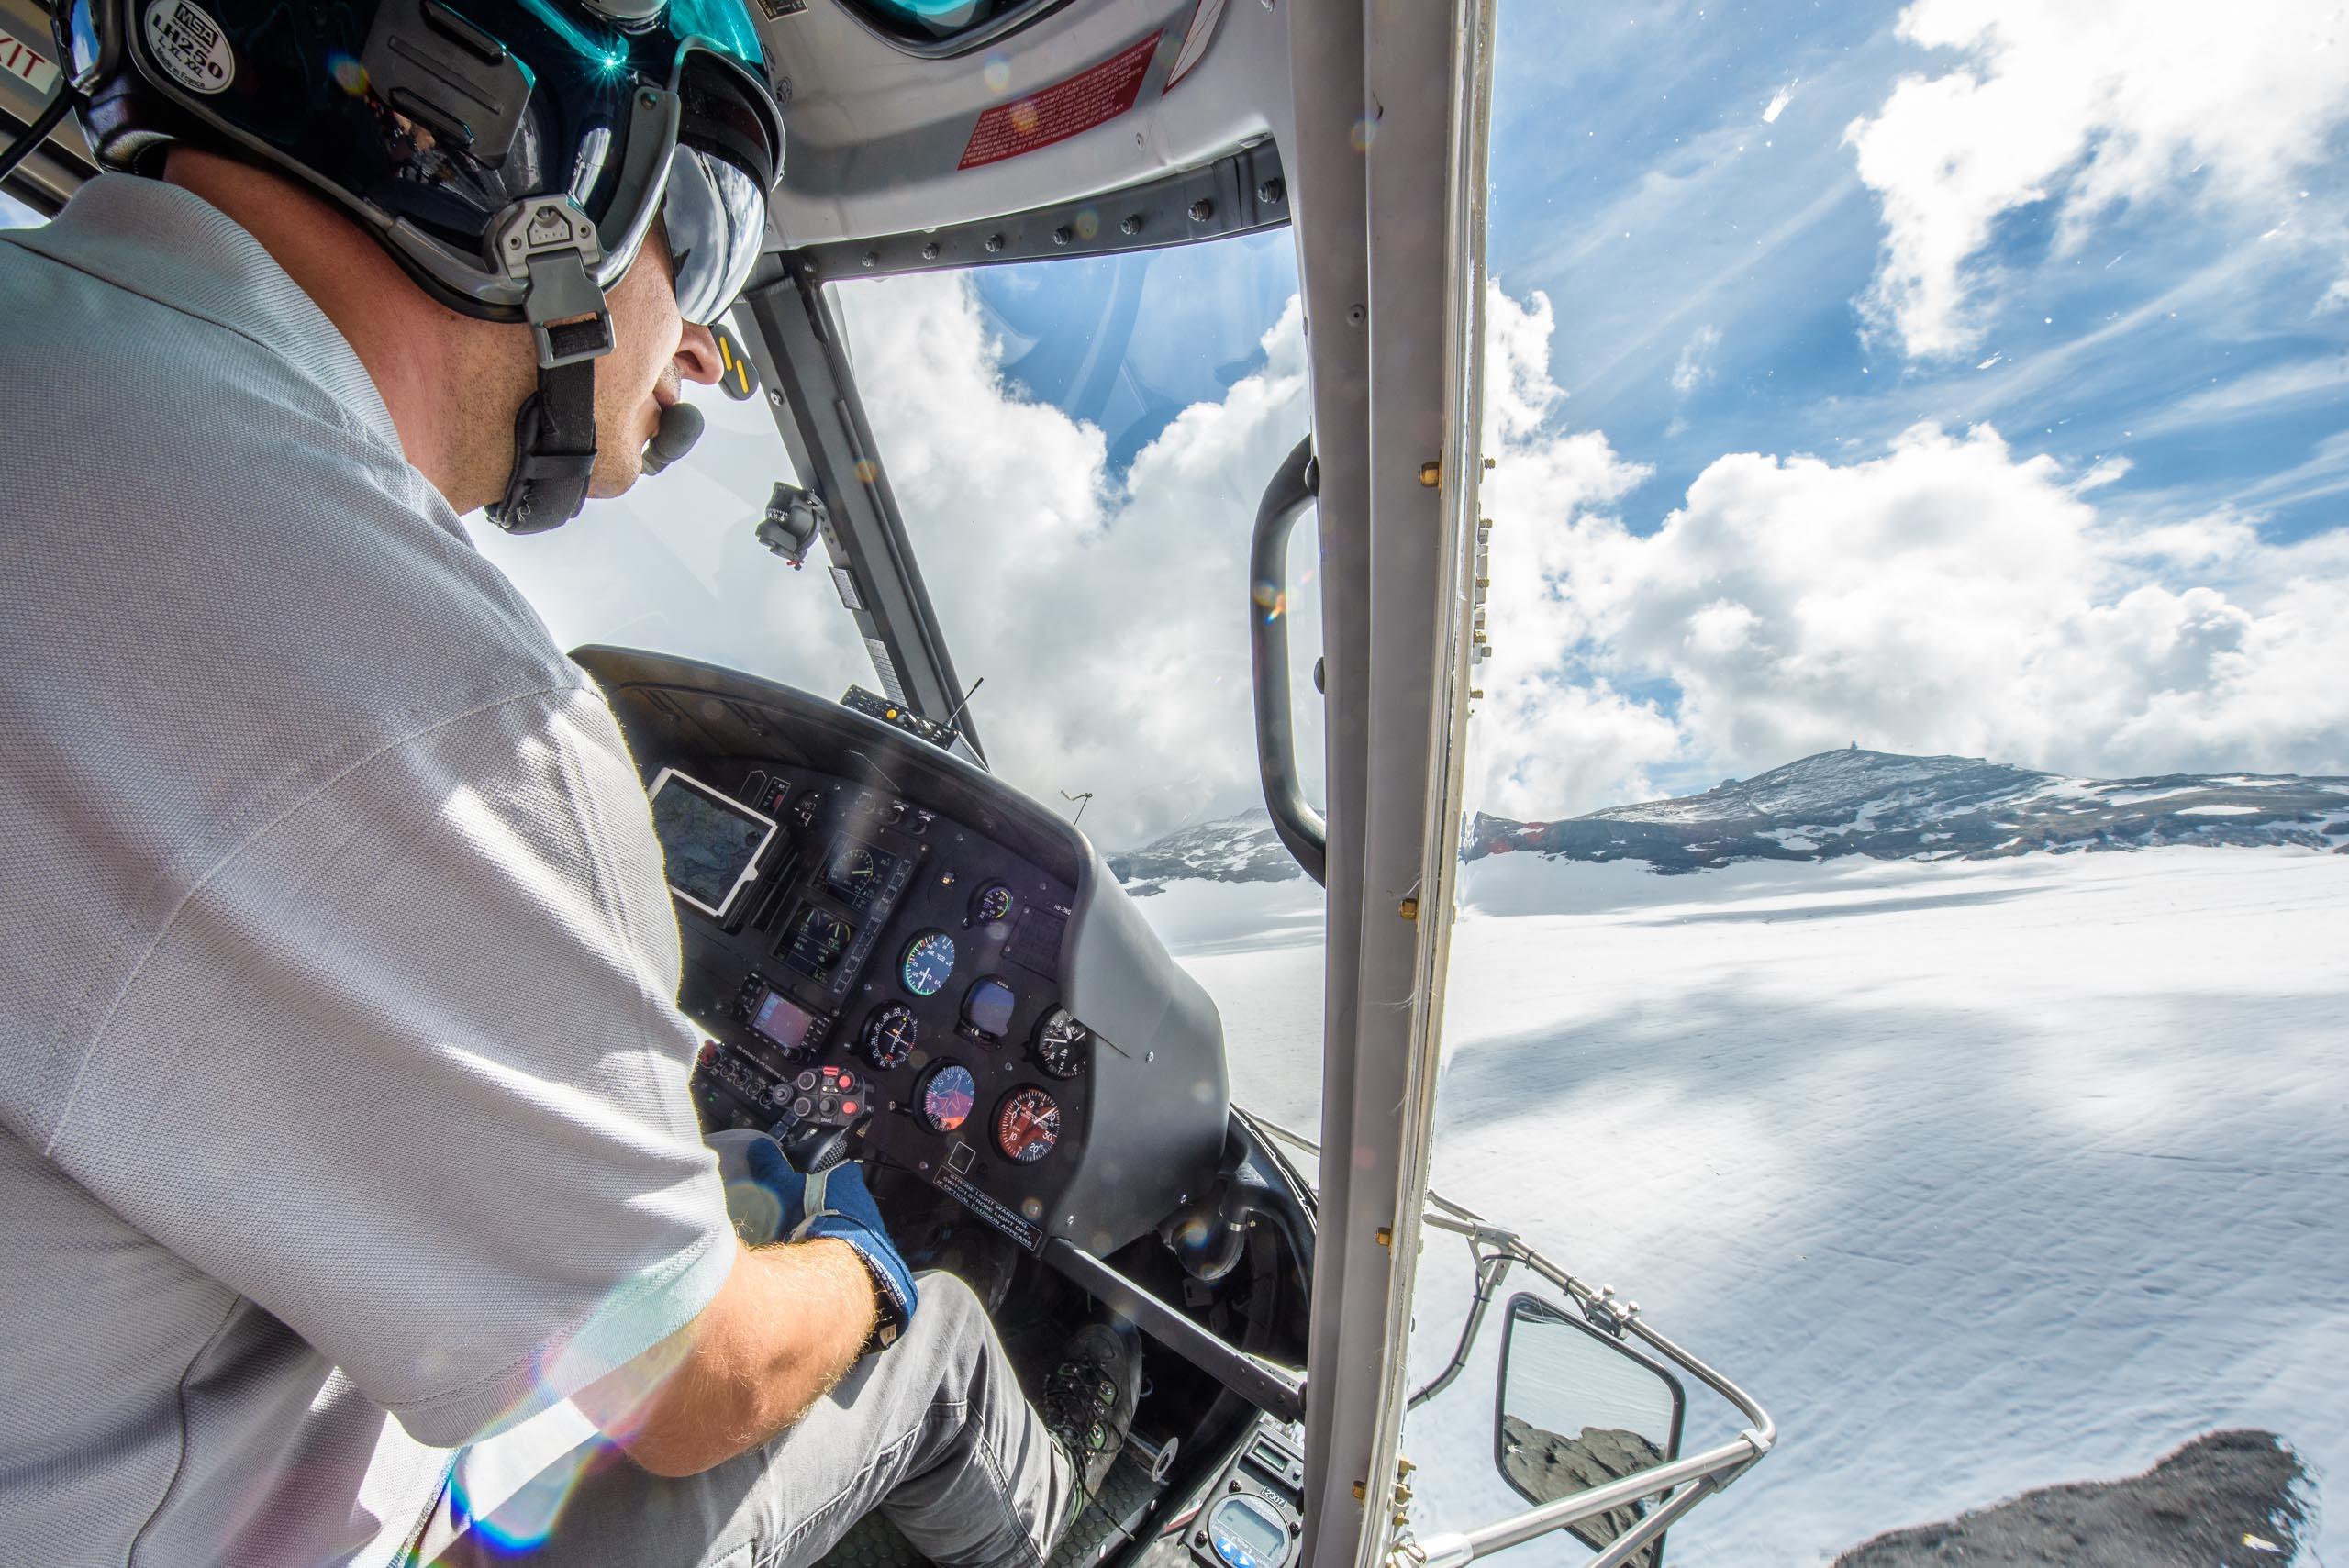 Helikopterflug-in-der-Schweiz